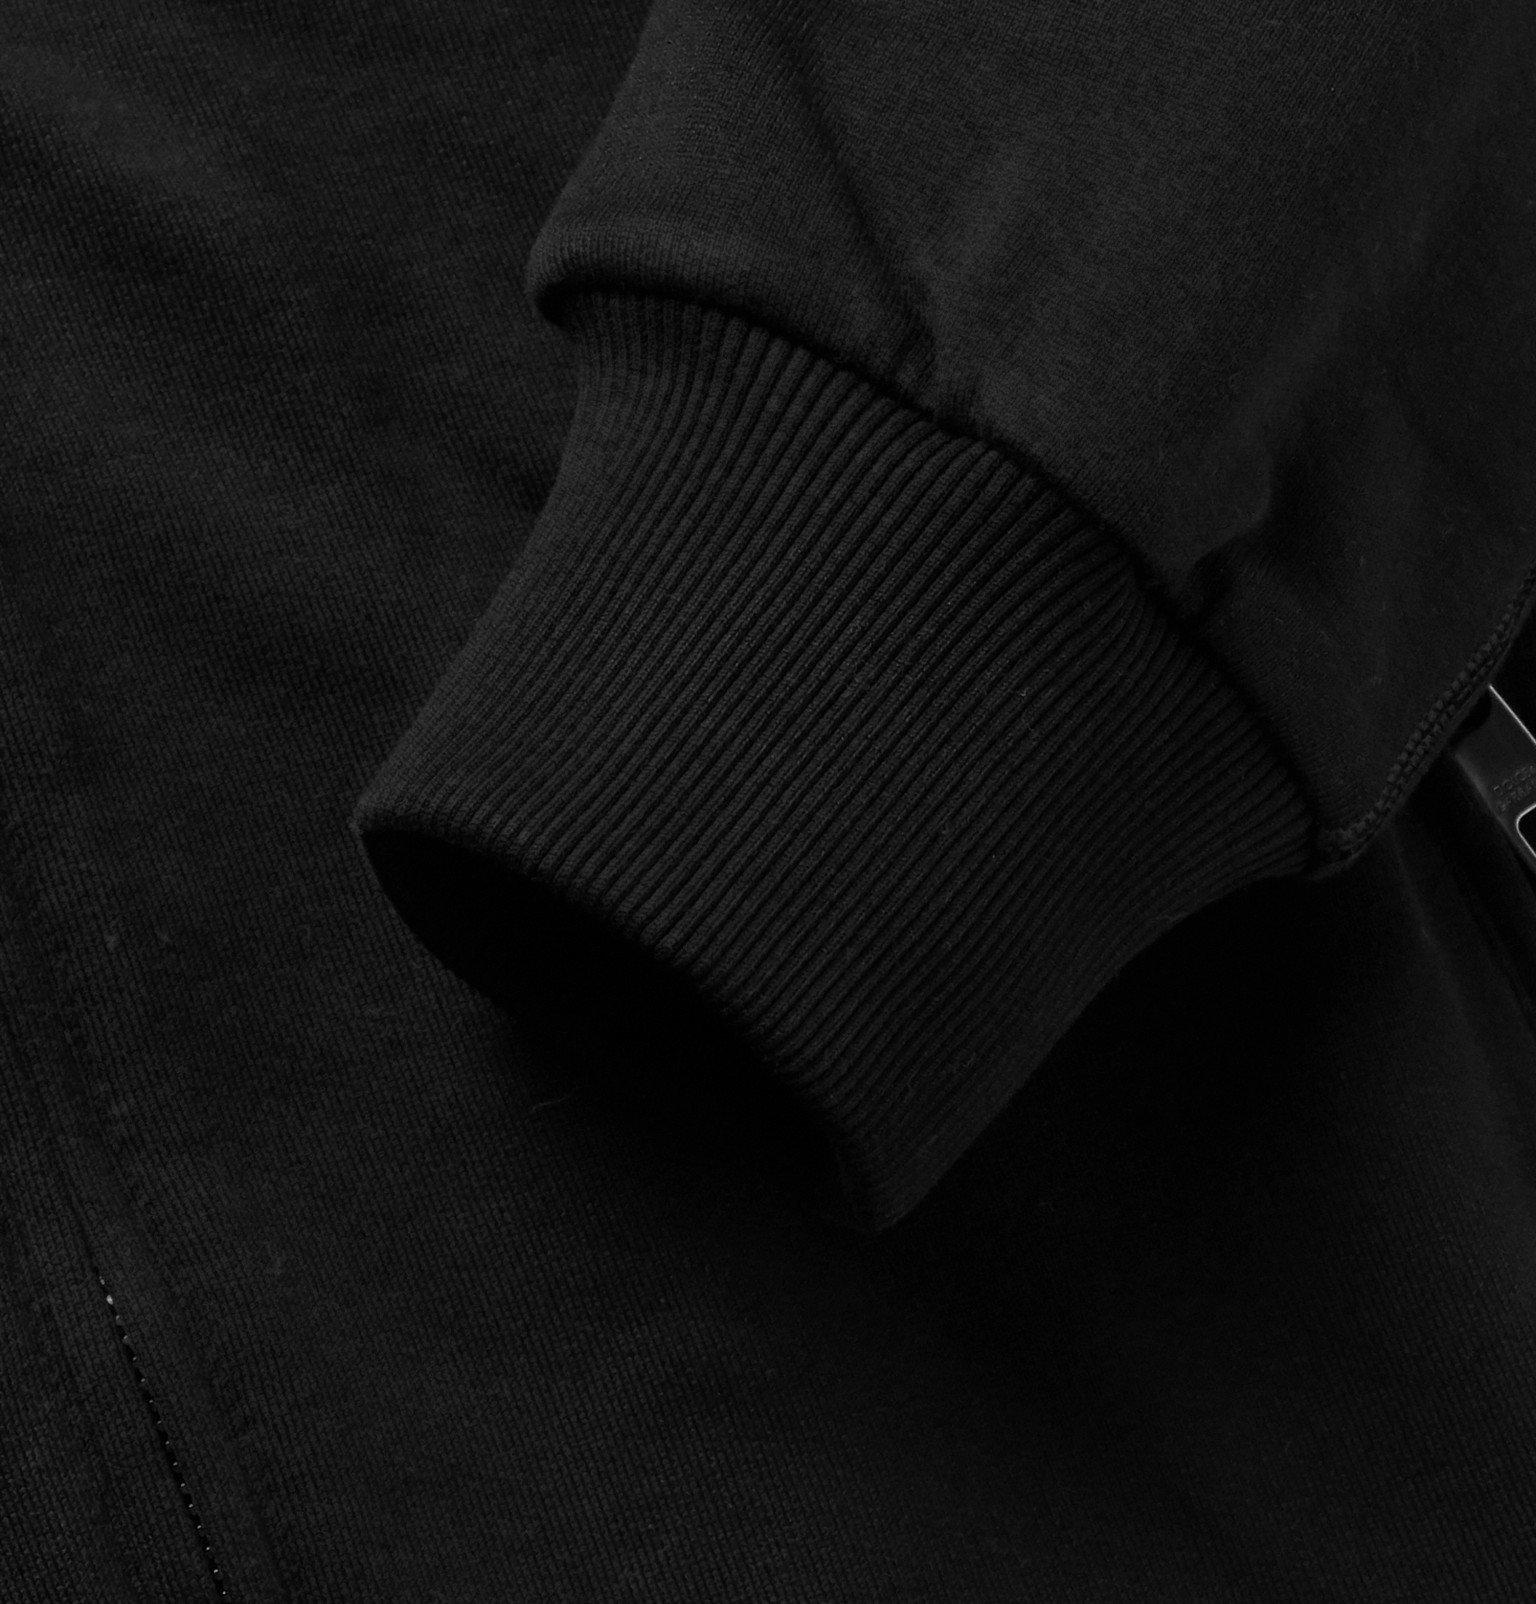 Dolce & Gabbana - Loopback Cotton-Jersey Zip-Up Hoodie - Black